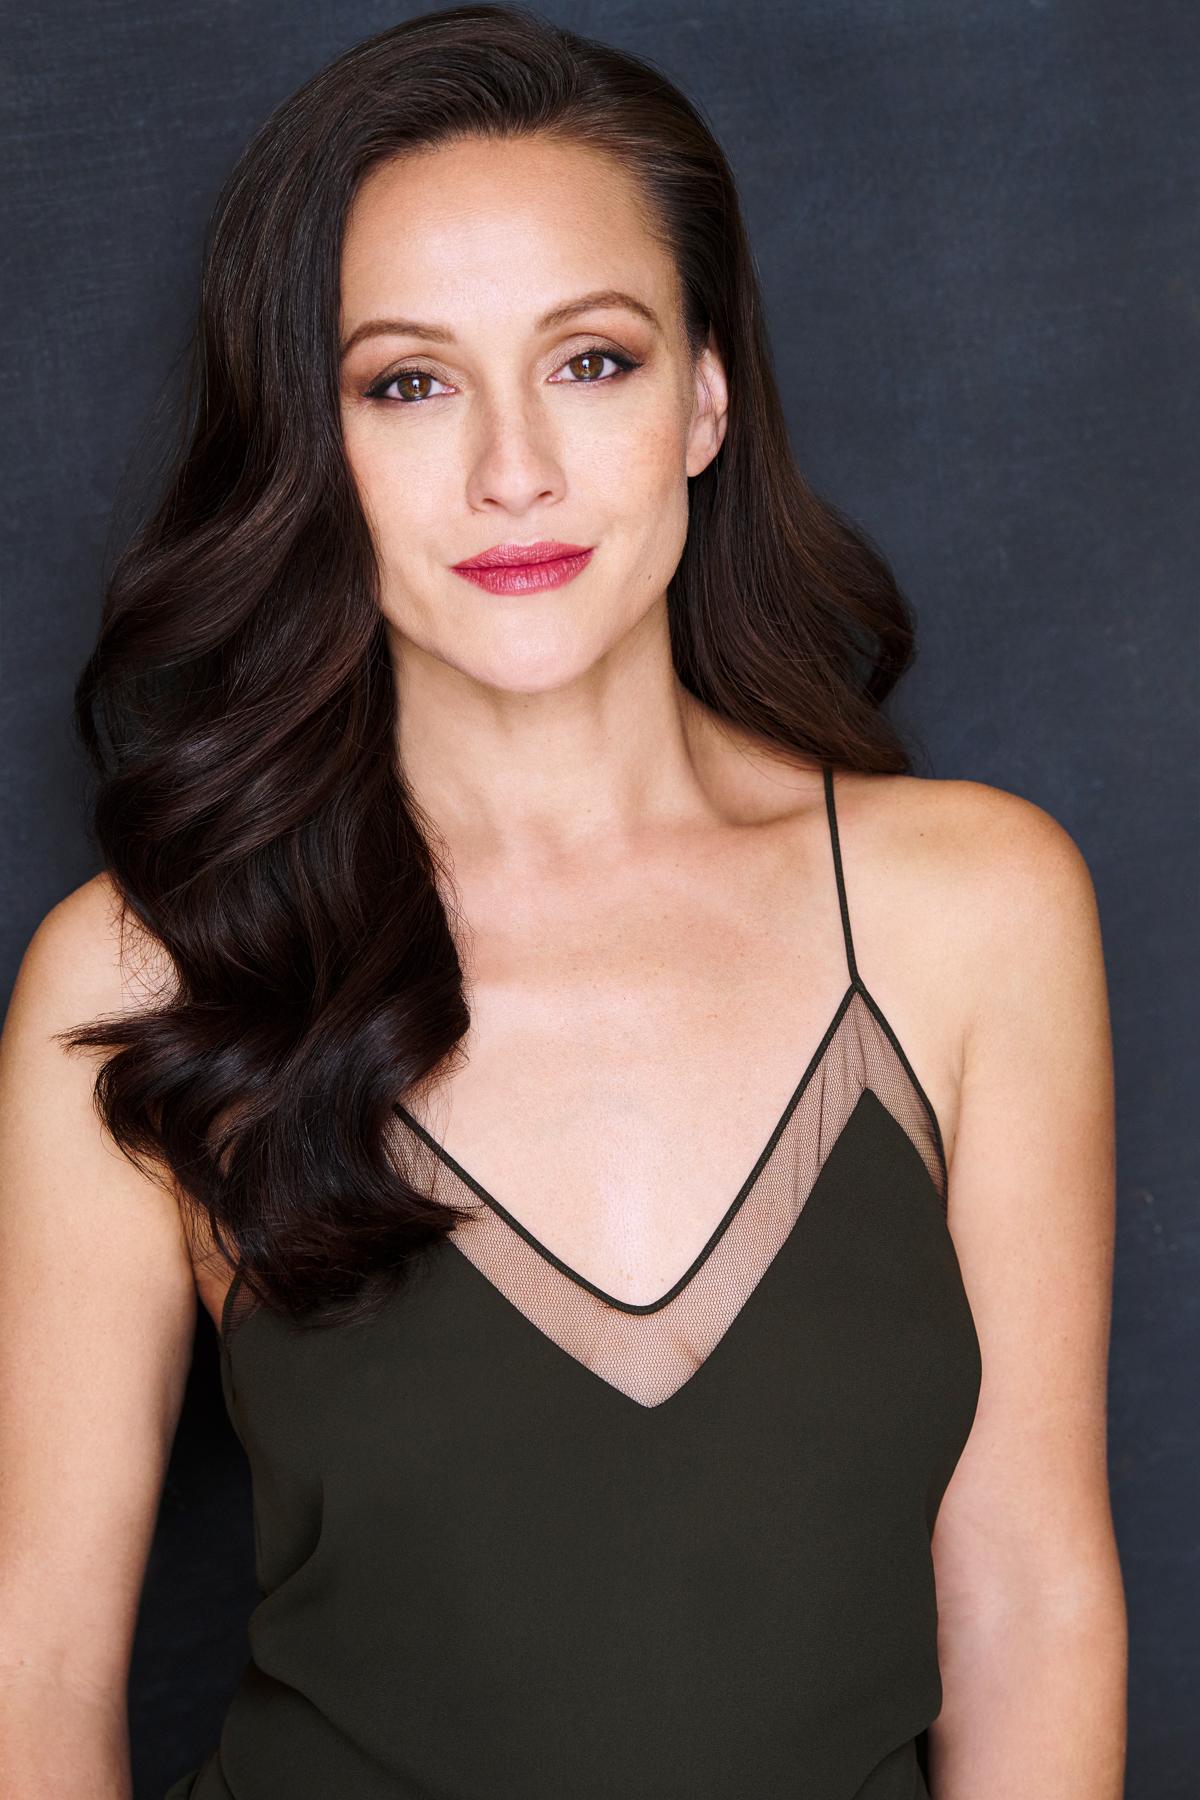 Yan-Kay Crystal Lowe